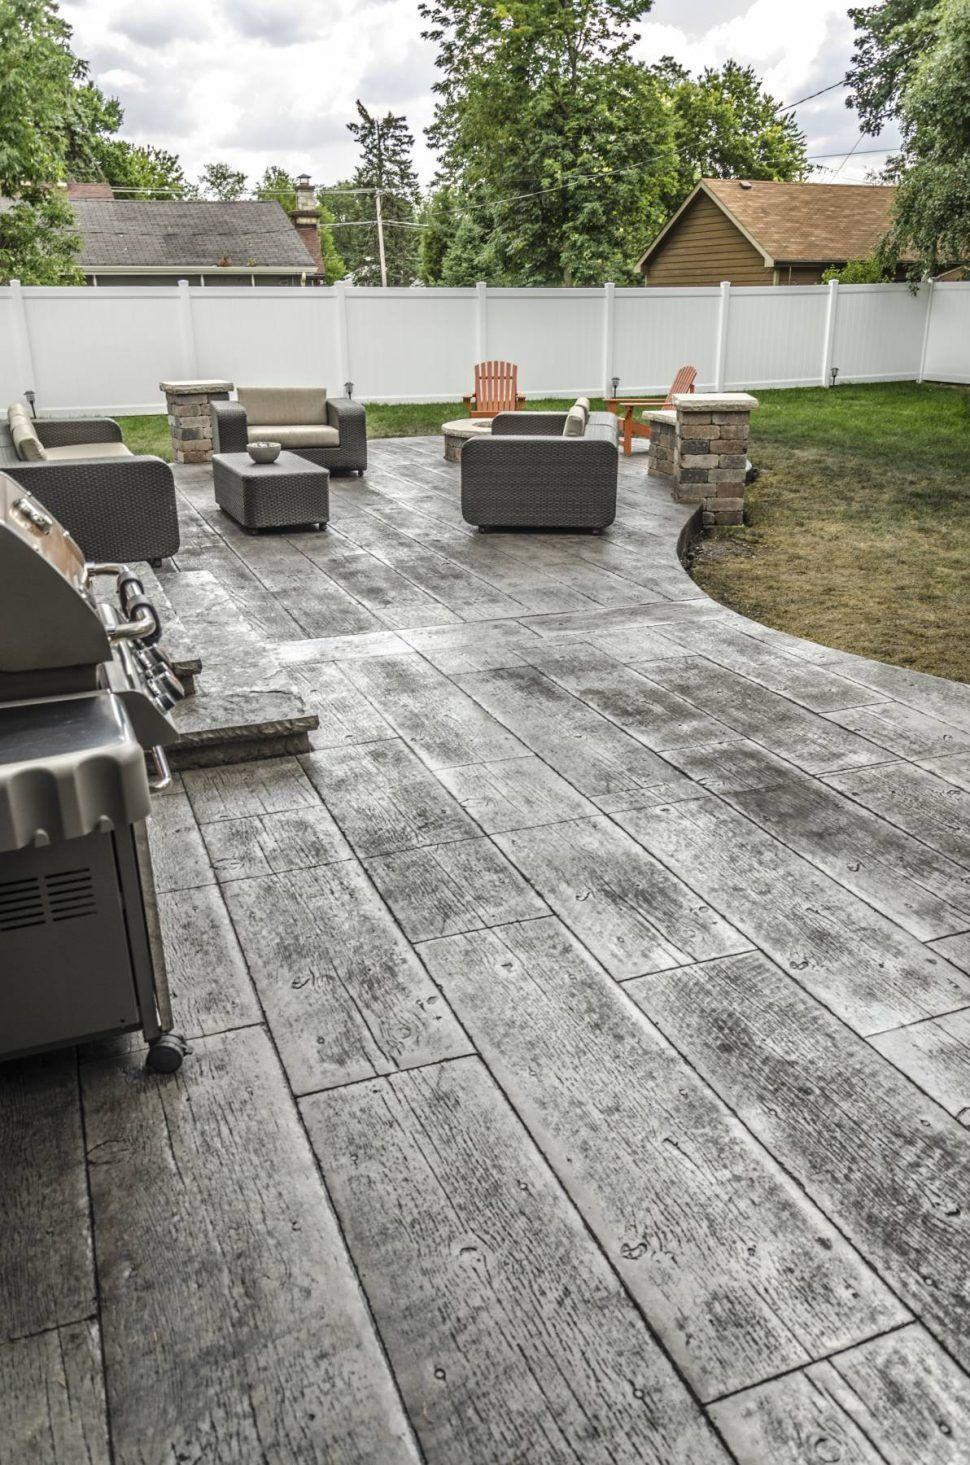 Http Cheappanda Com Great Concrete Patio Proj Gifabapa Concrete Patio Surfacing K M Inc Patter Concrete Backyard Concrete Patio Designs Terrace Garden Design